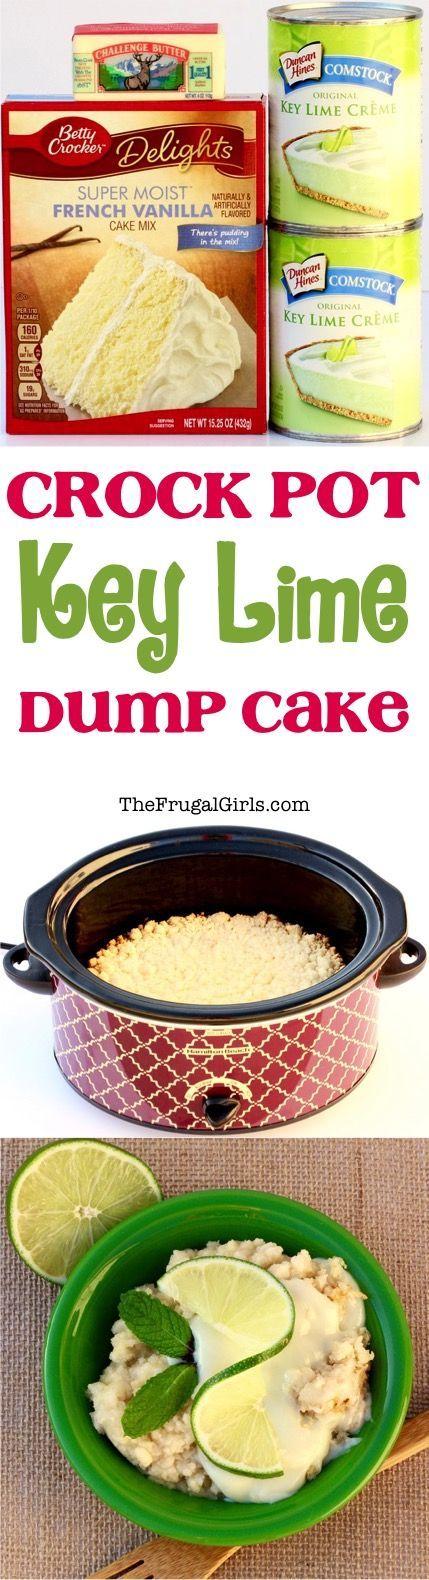 Crock Pot Key Lime Dump Cake Recipe Just A Few Easy